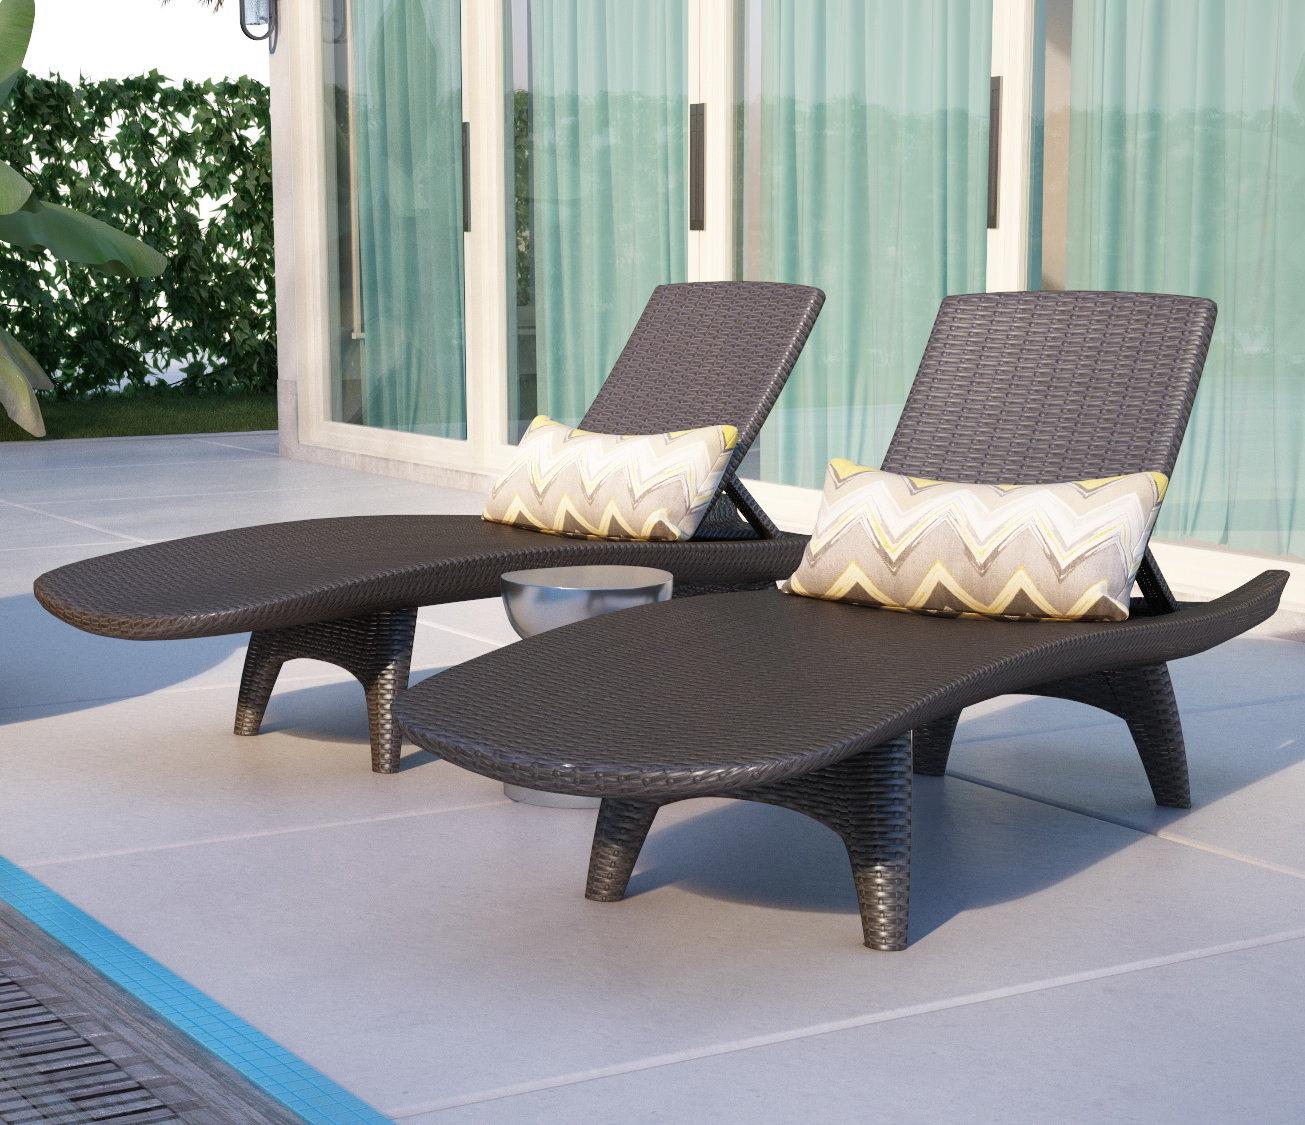 outdoor lounge chairs save YIKNUYE